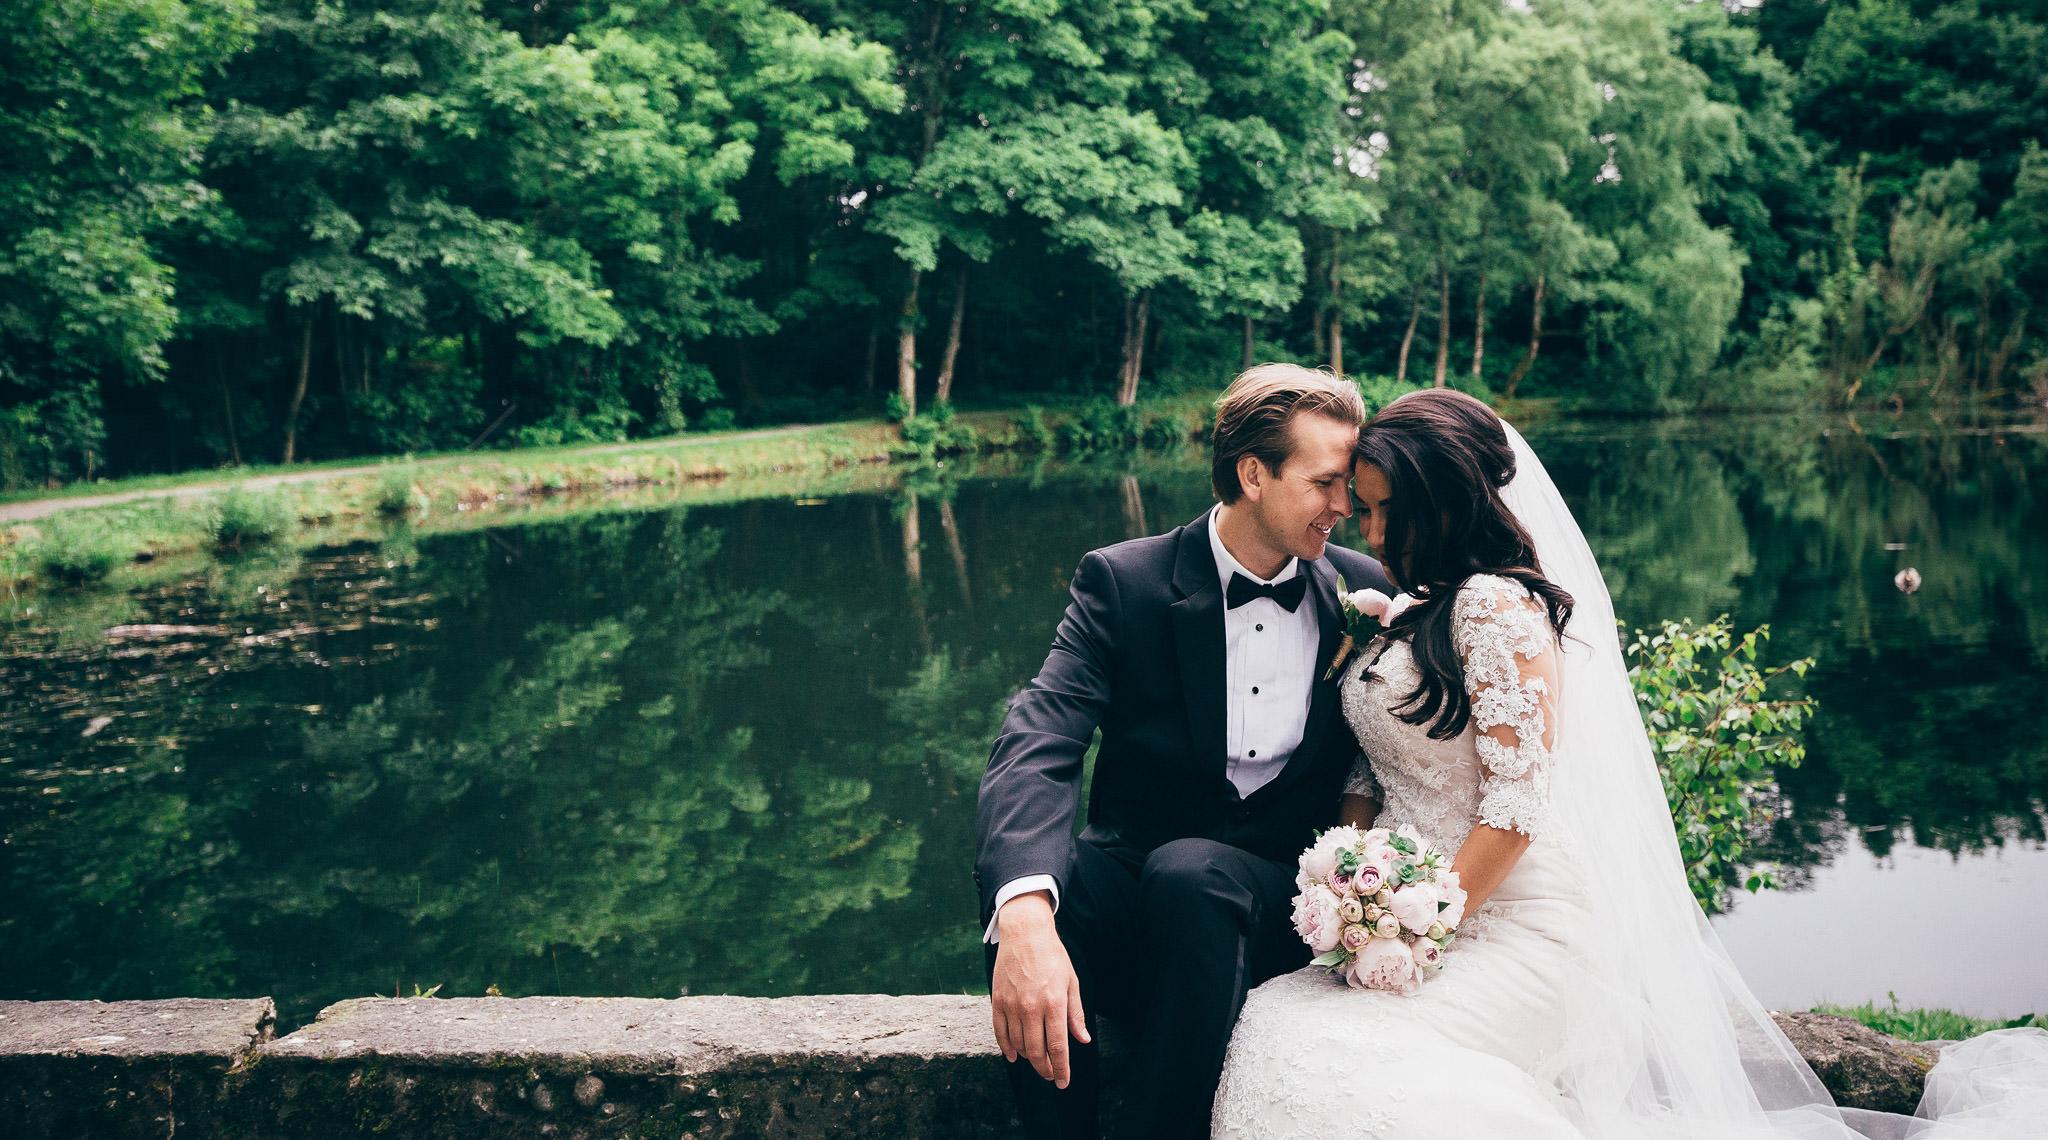 Wedding+Photographer+Norway+Bryllupsfotograf+Casey+Arneson+MK-166.jpg